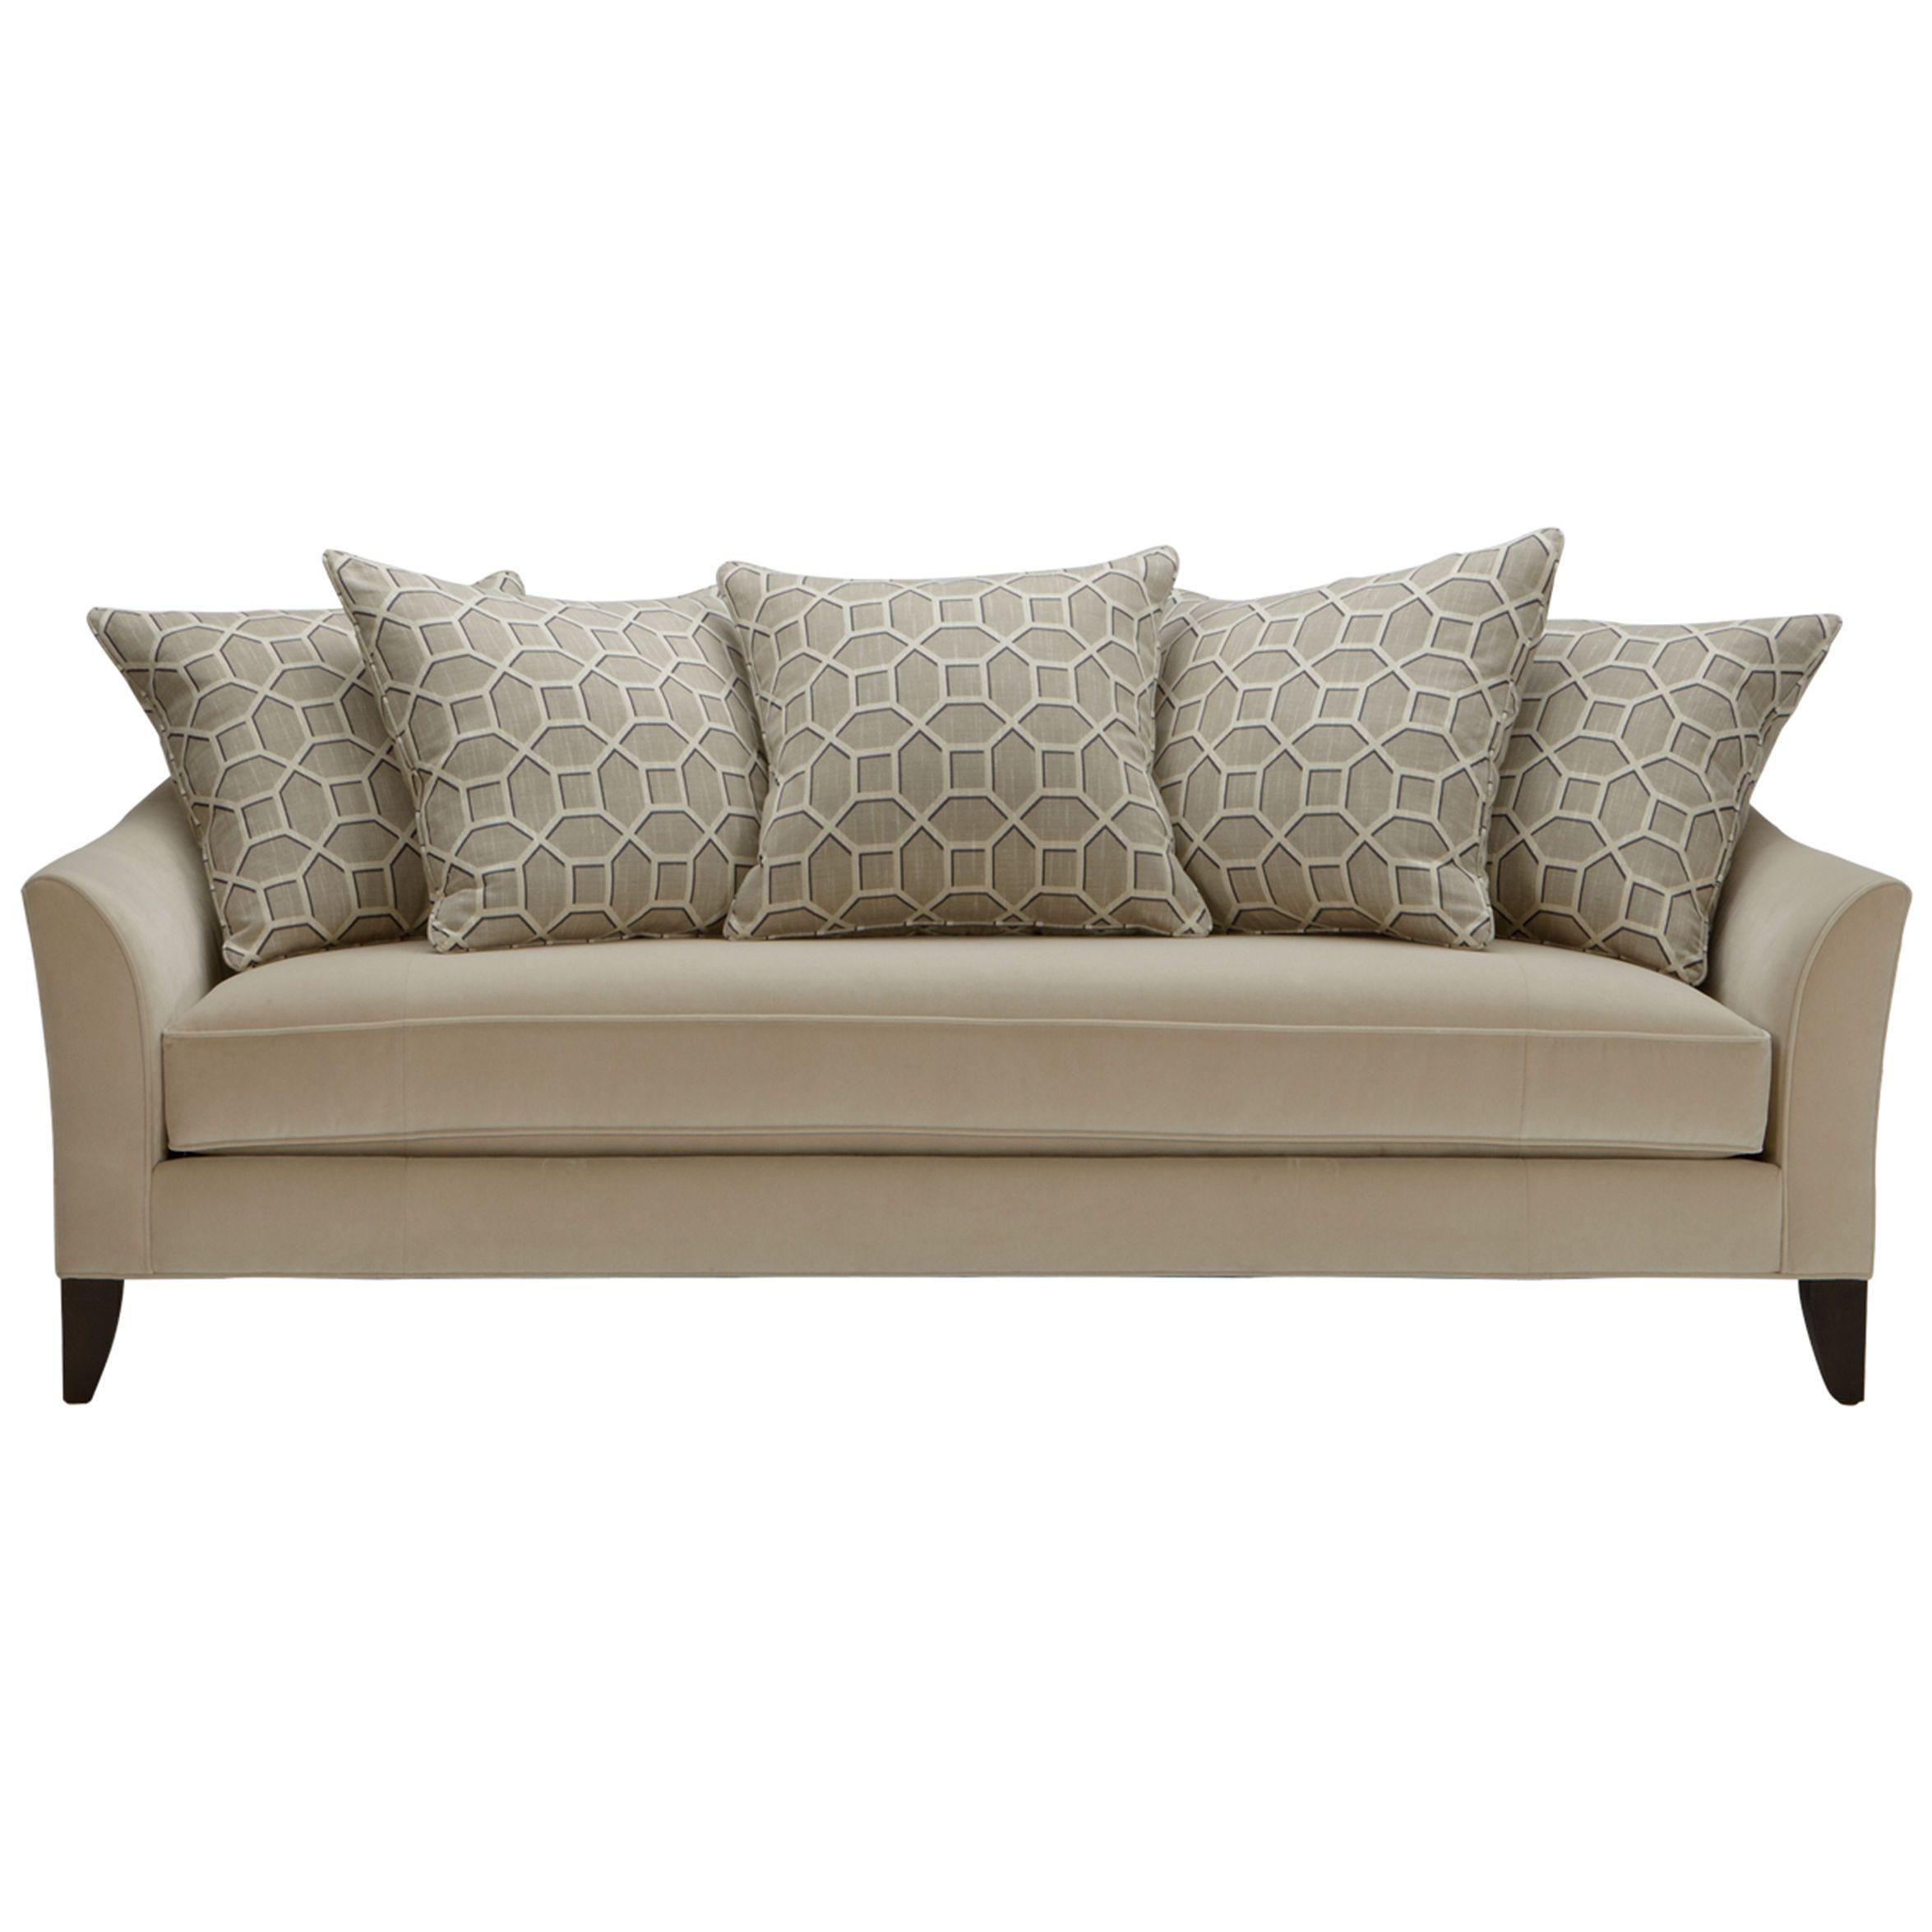 Carlotta Bench-Cushion Sofa - Ethan Allen US | Great Room Furniture ...